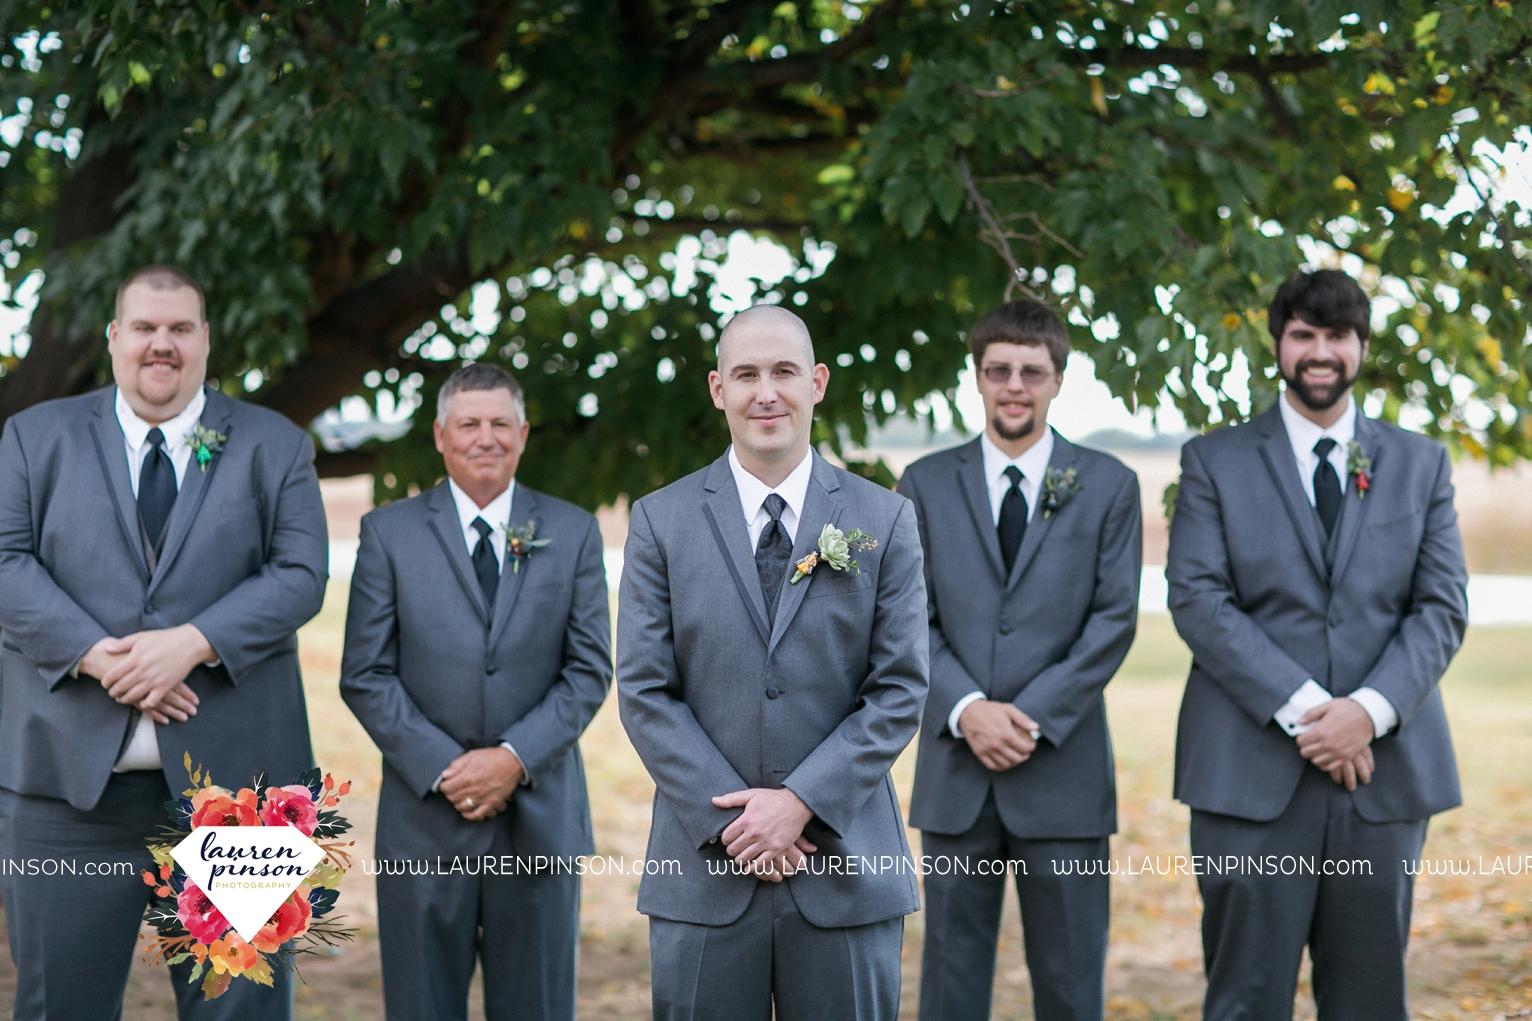 kemp-center-for-the-arts-wichita-falls-texas-wedding-photographer-fall-wedding-pumpkins-146.jpg